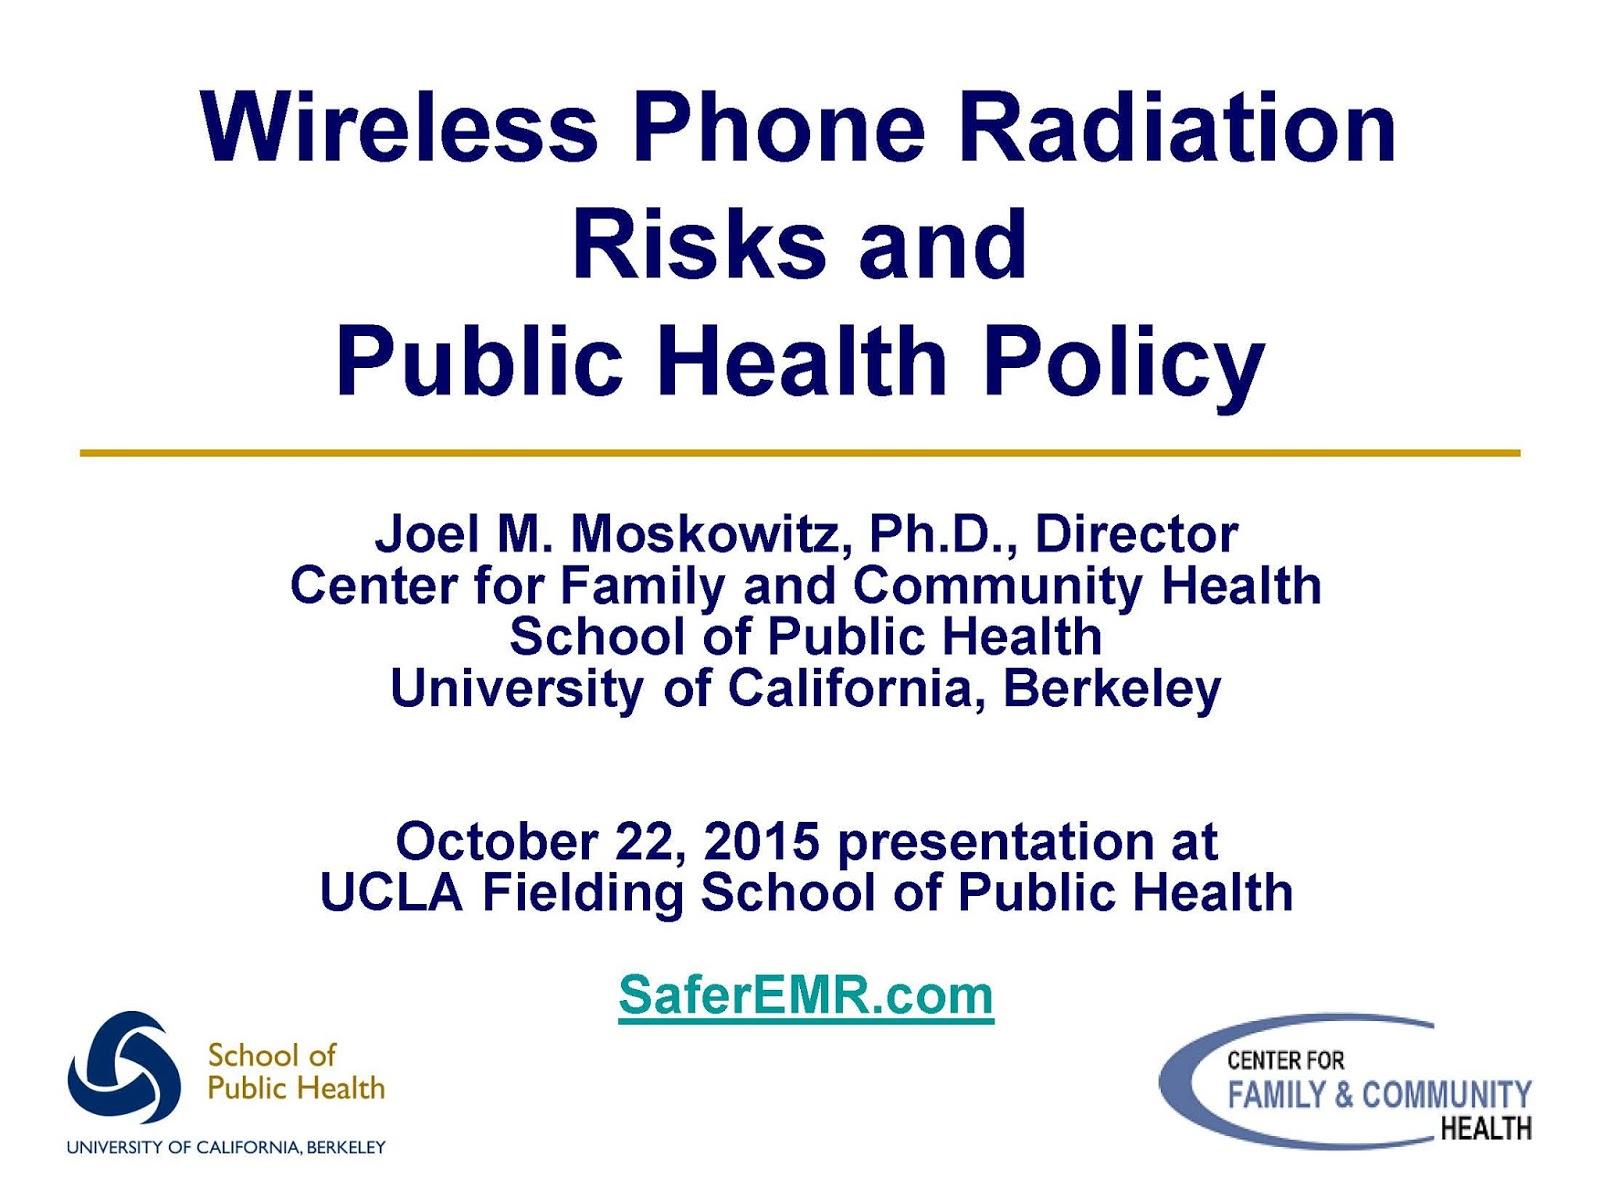 Electromagnetic Radiation Safety: Wireless Phone Radiation